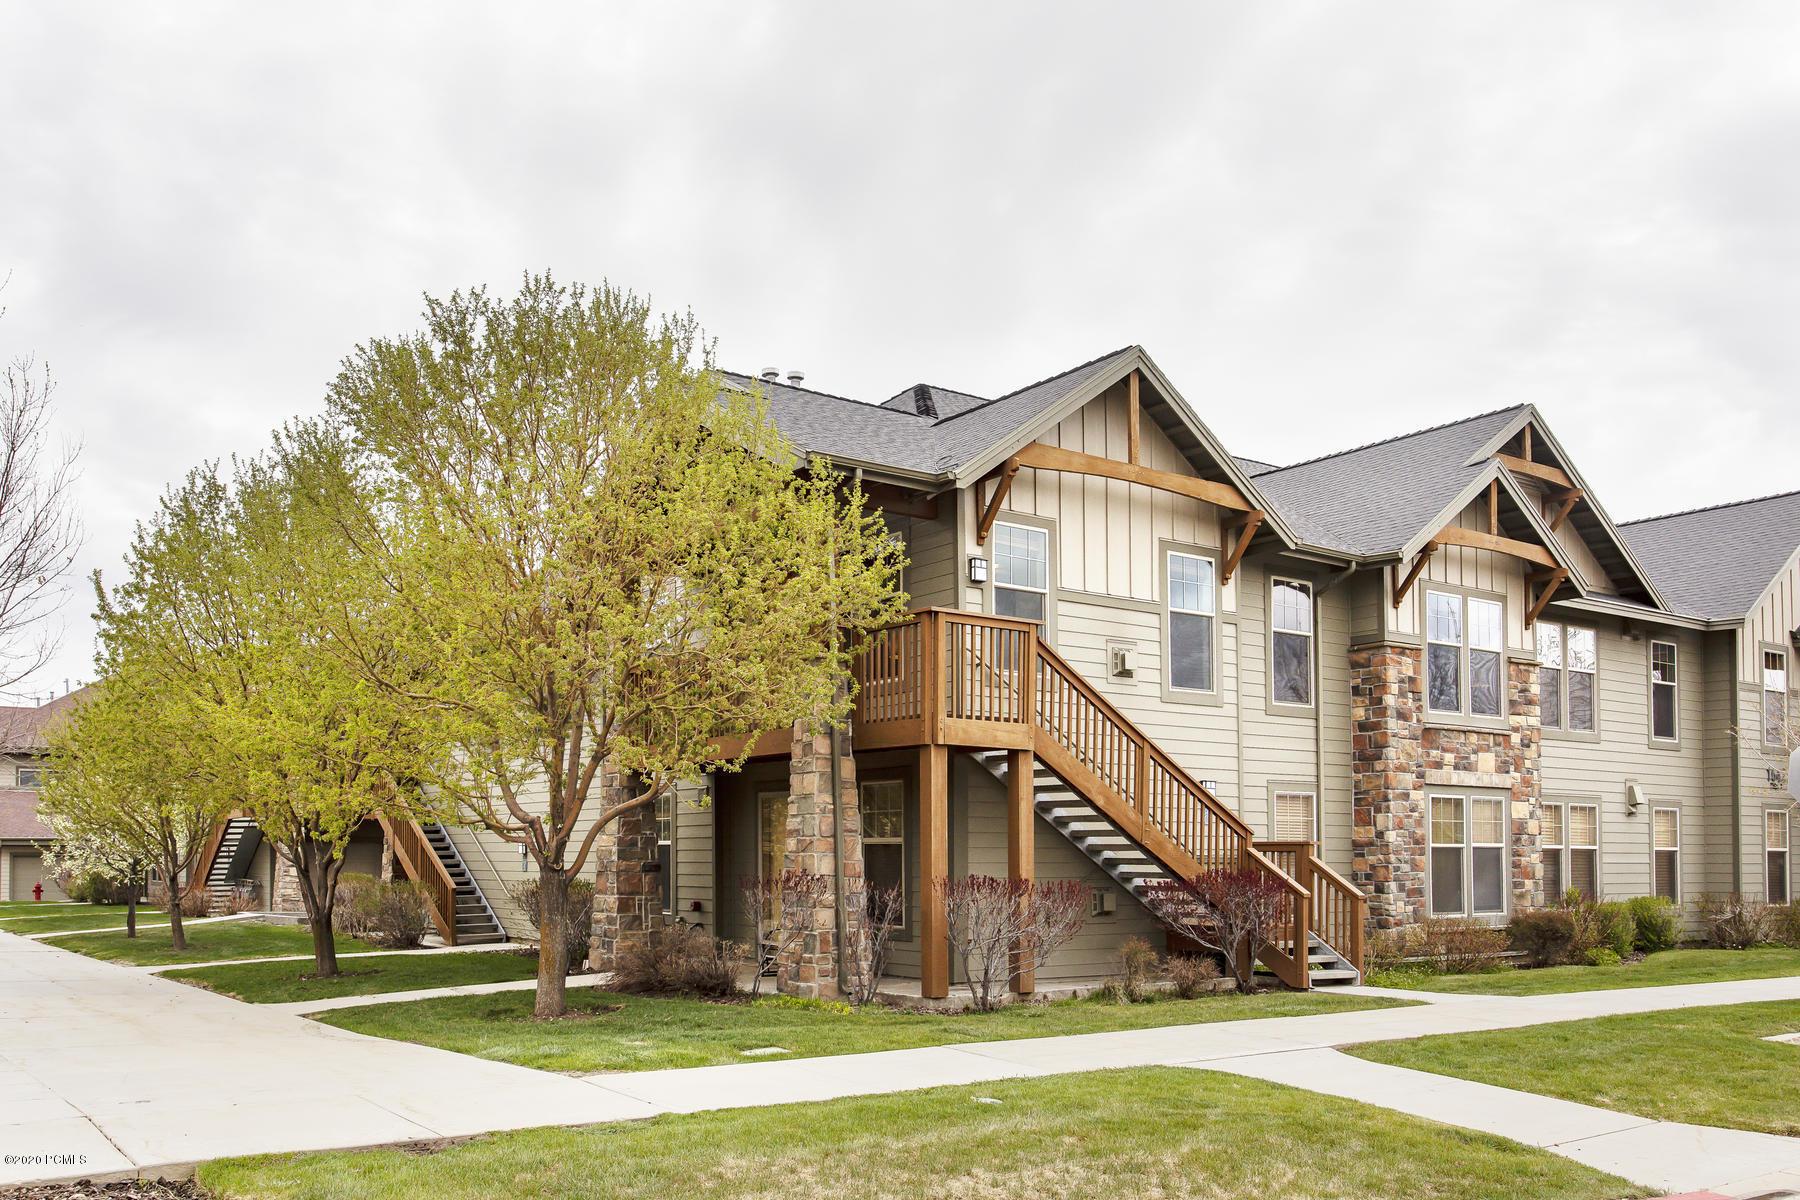 1642 Redstone Avenue, Park City, Utah 84098, 2 Bedrooms Bedrooms, ,2 BathroomsBathrooms,Condominium,For Sale,Redstone,20190109112430415765000000